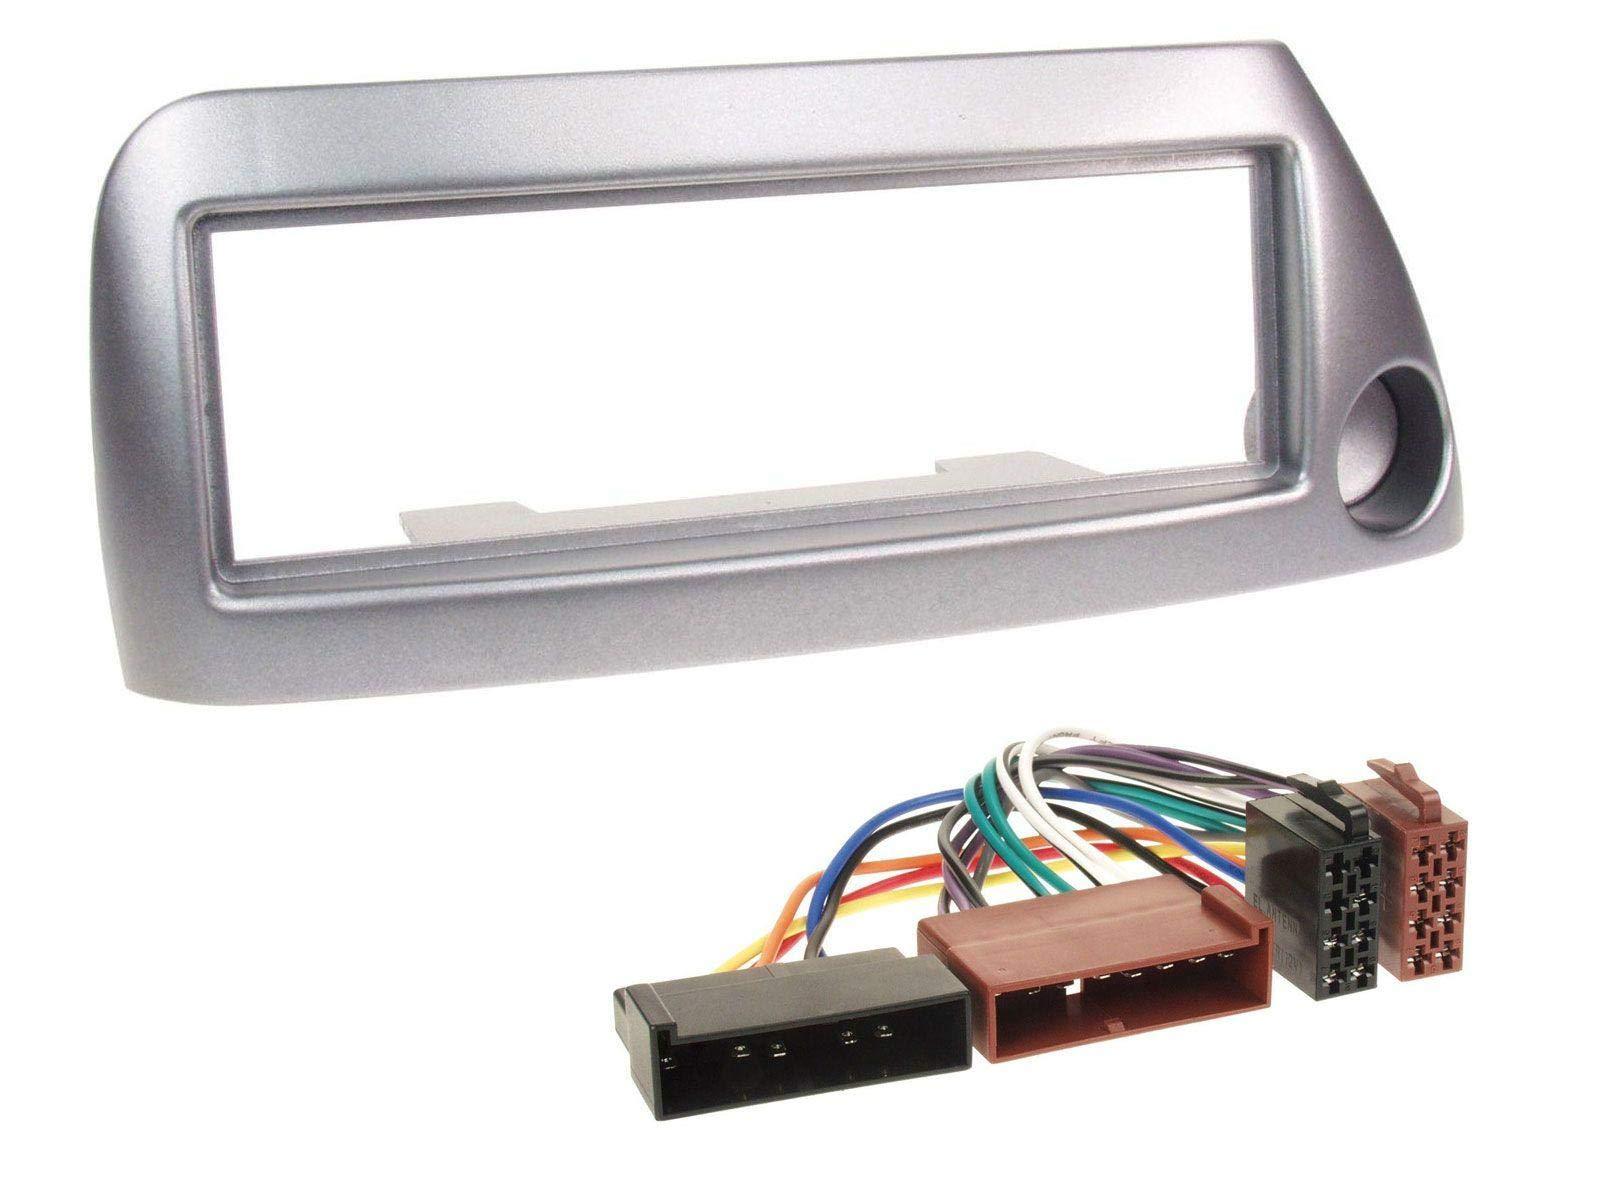 caraudio24-JVC-KD-R992BT-Bluetooth-MP3-CD-AUX-USB-Autoradio-fr-Ford-Ka-bis-2008-Silber-metallic